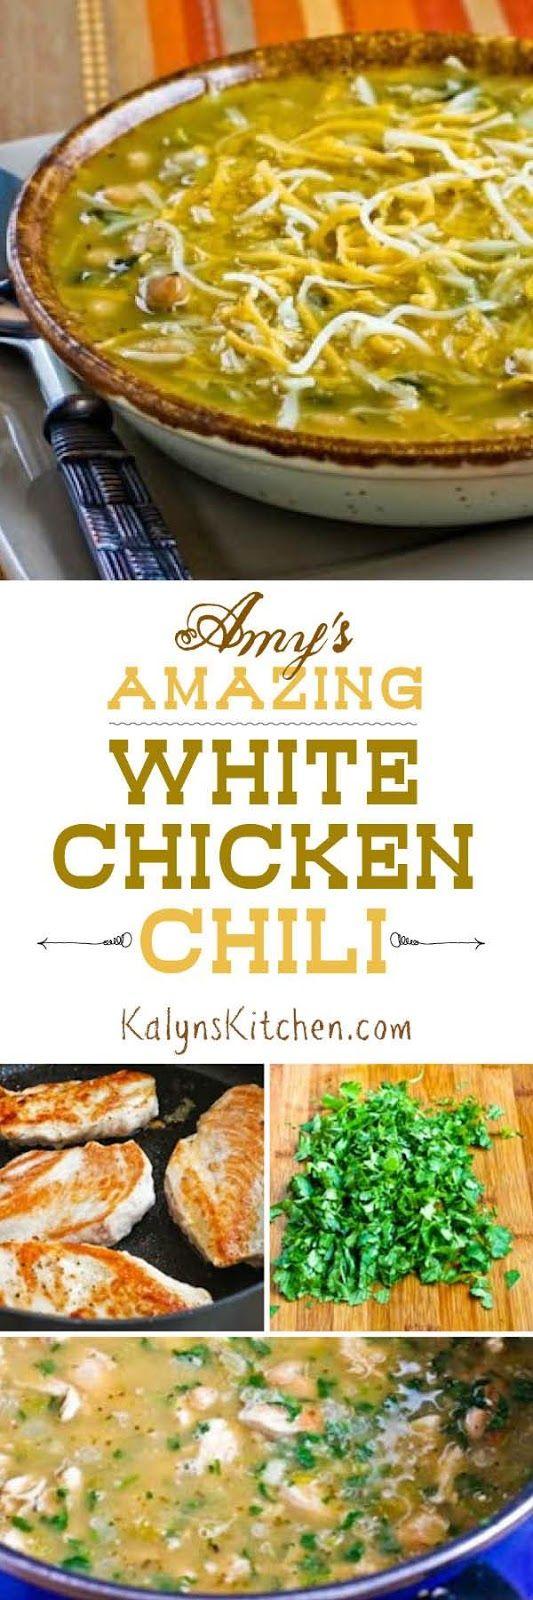 Amy's Amazing White Chicken Chili [found on KalynsKitchen.com]